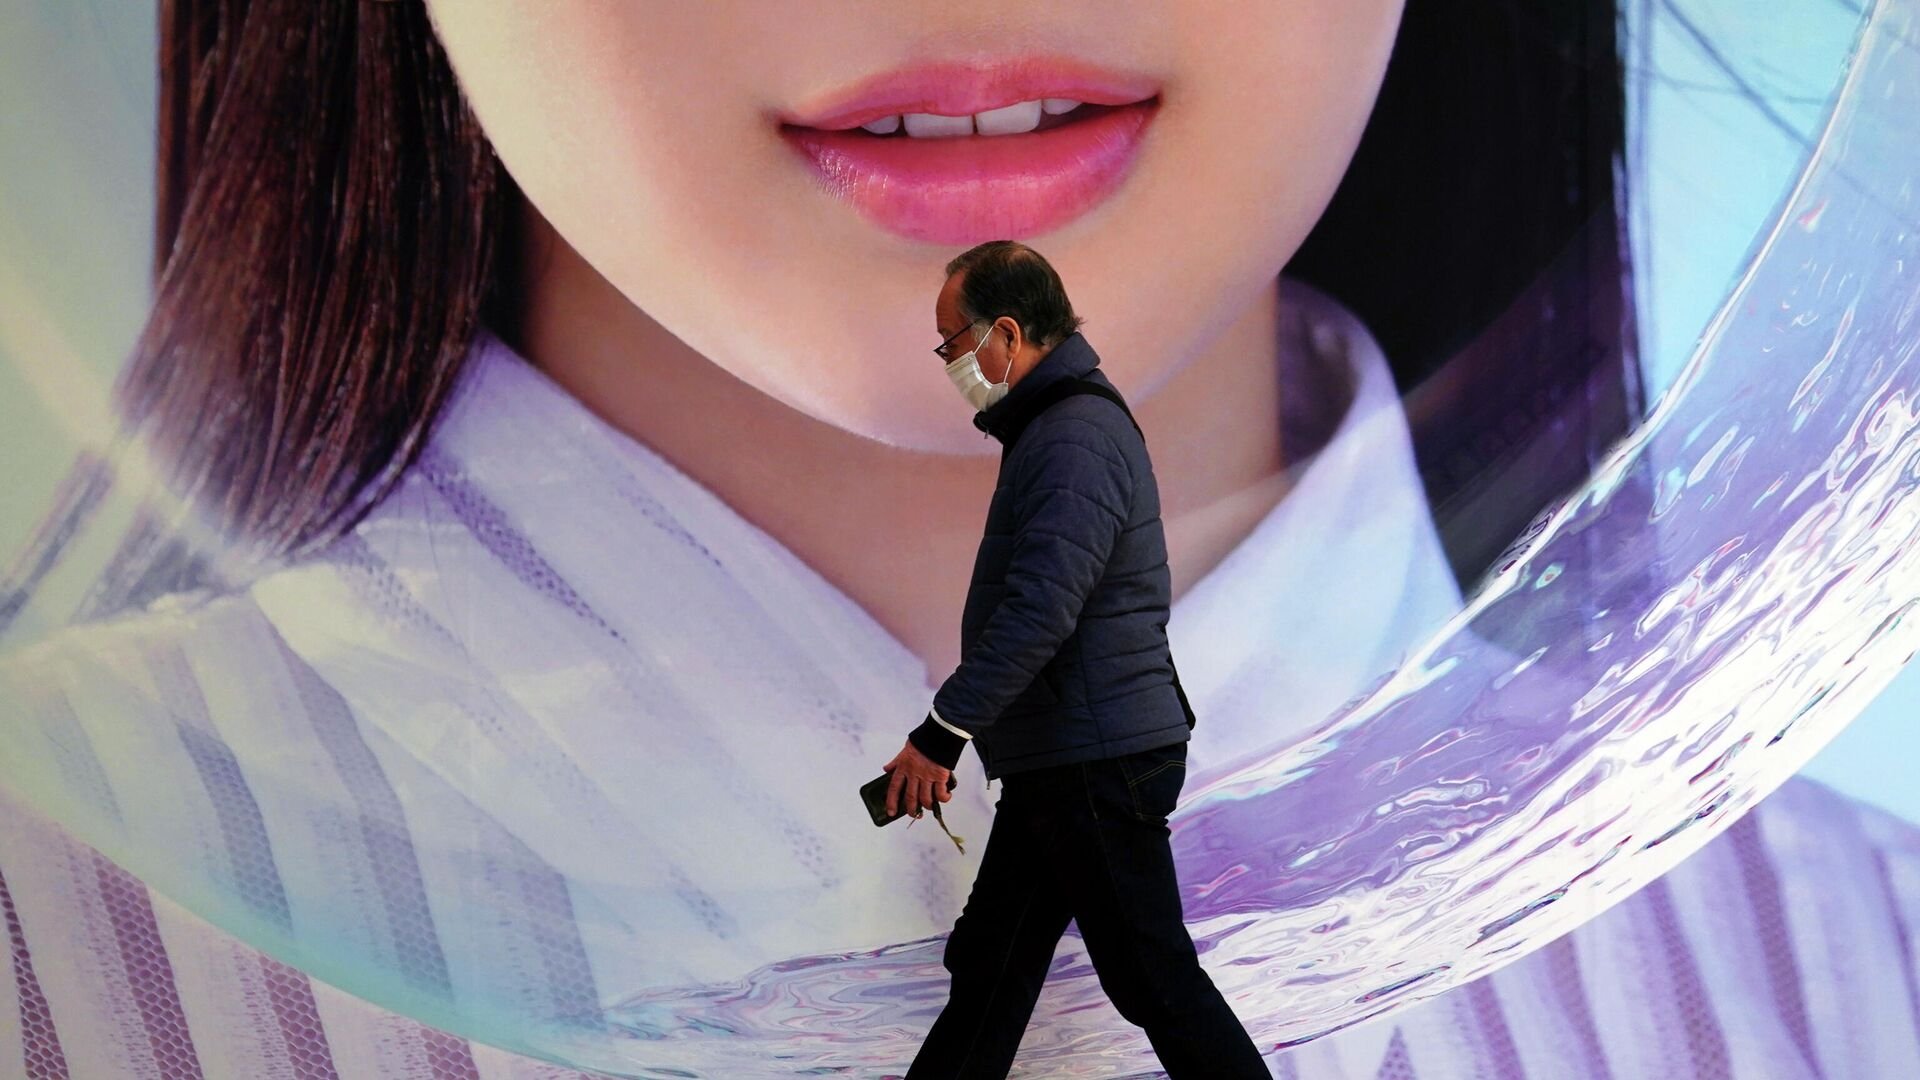 Мужчина в защитной маске проходит мимо рекламного щита в Токио - РИА Новости, 1920, 03.03.2021